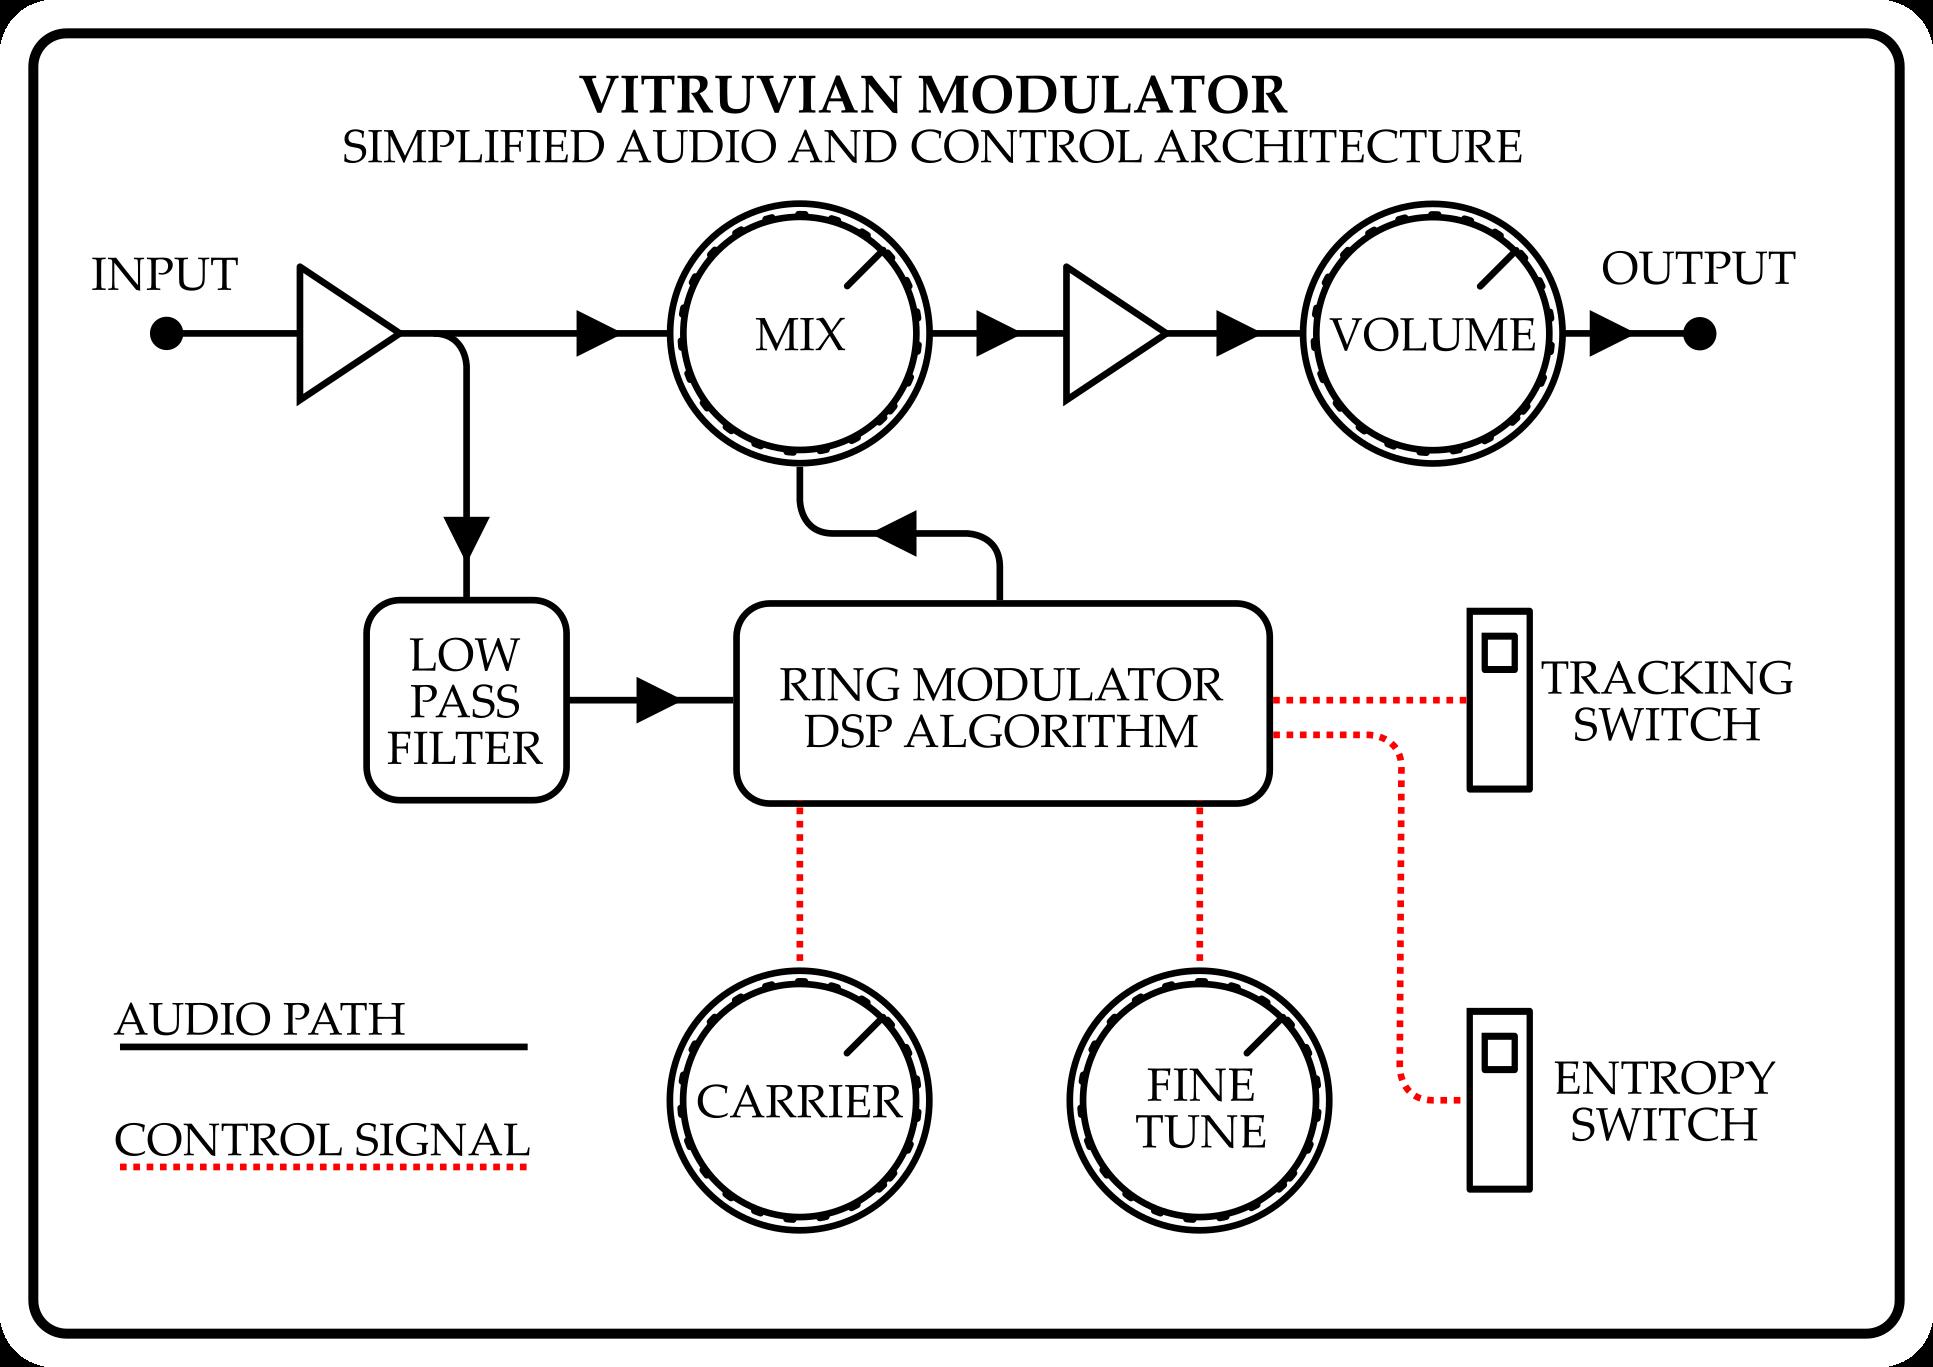 Vitruvian mod architecture